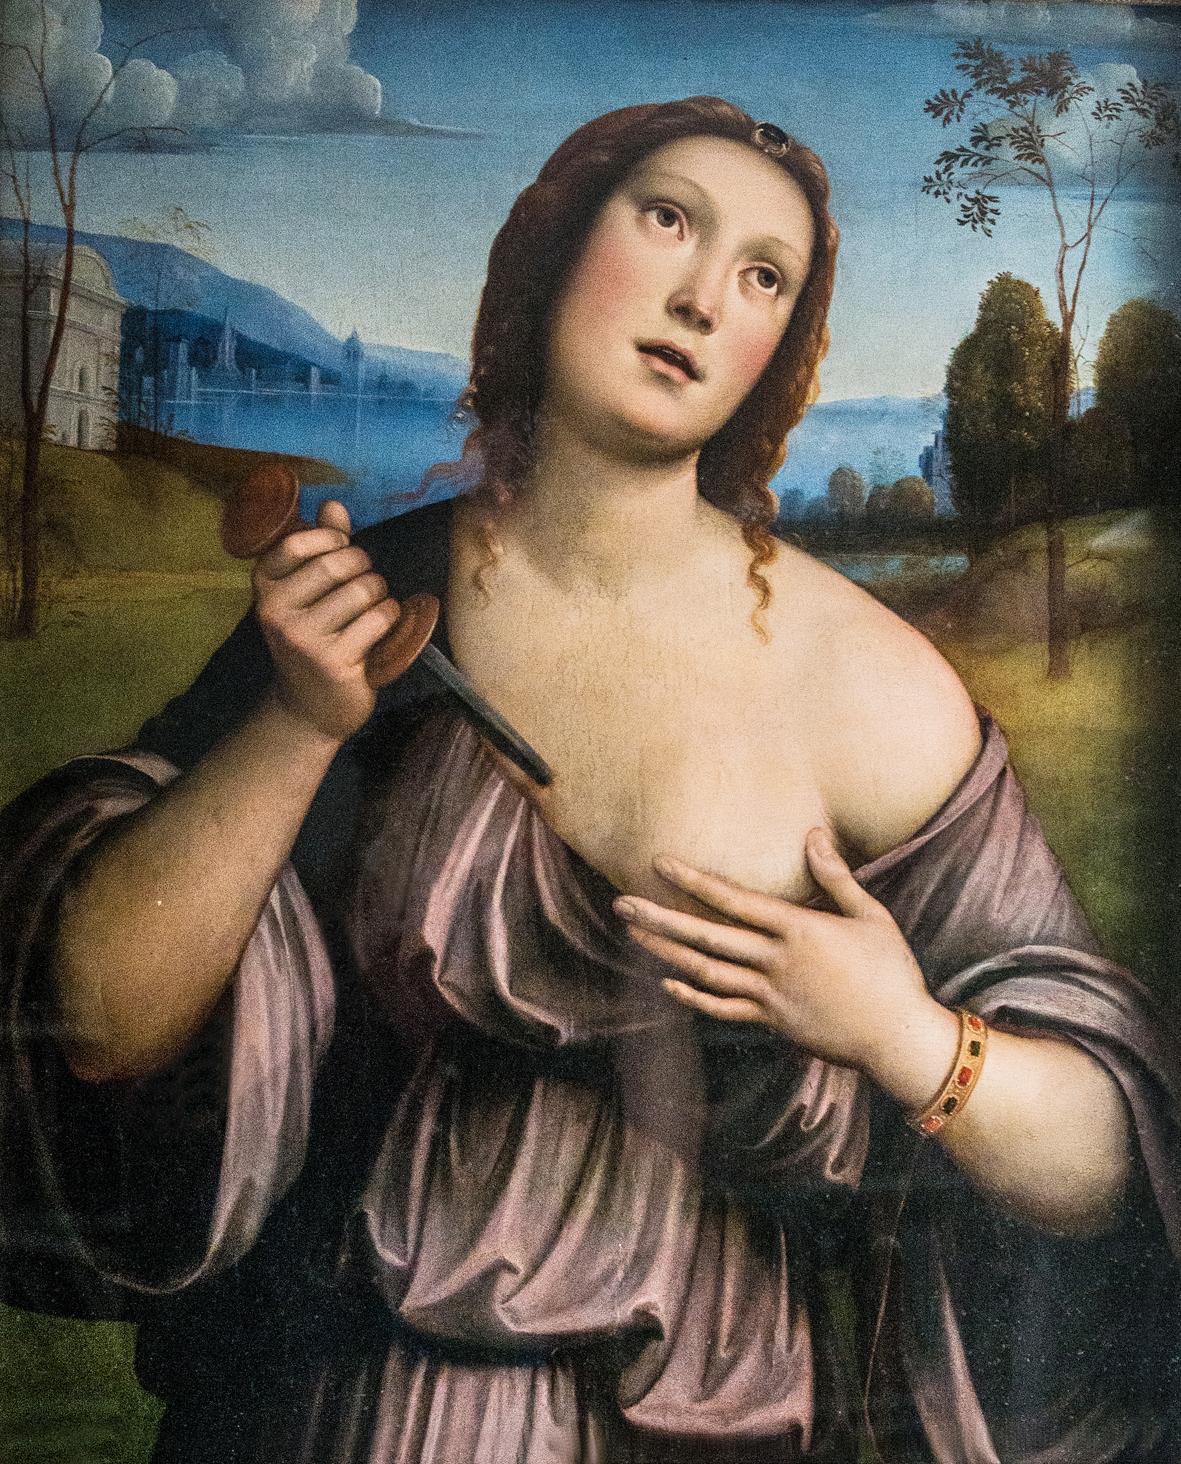 Francesco Francia, Lucrezia Romana